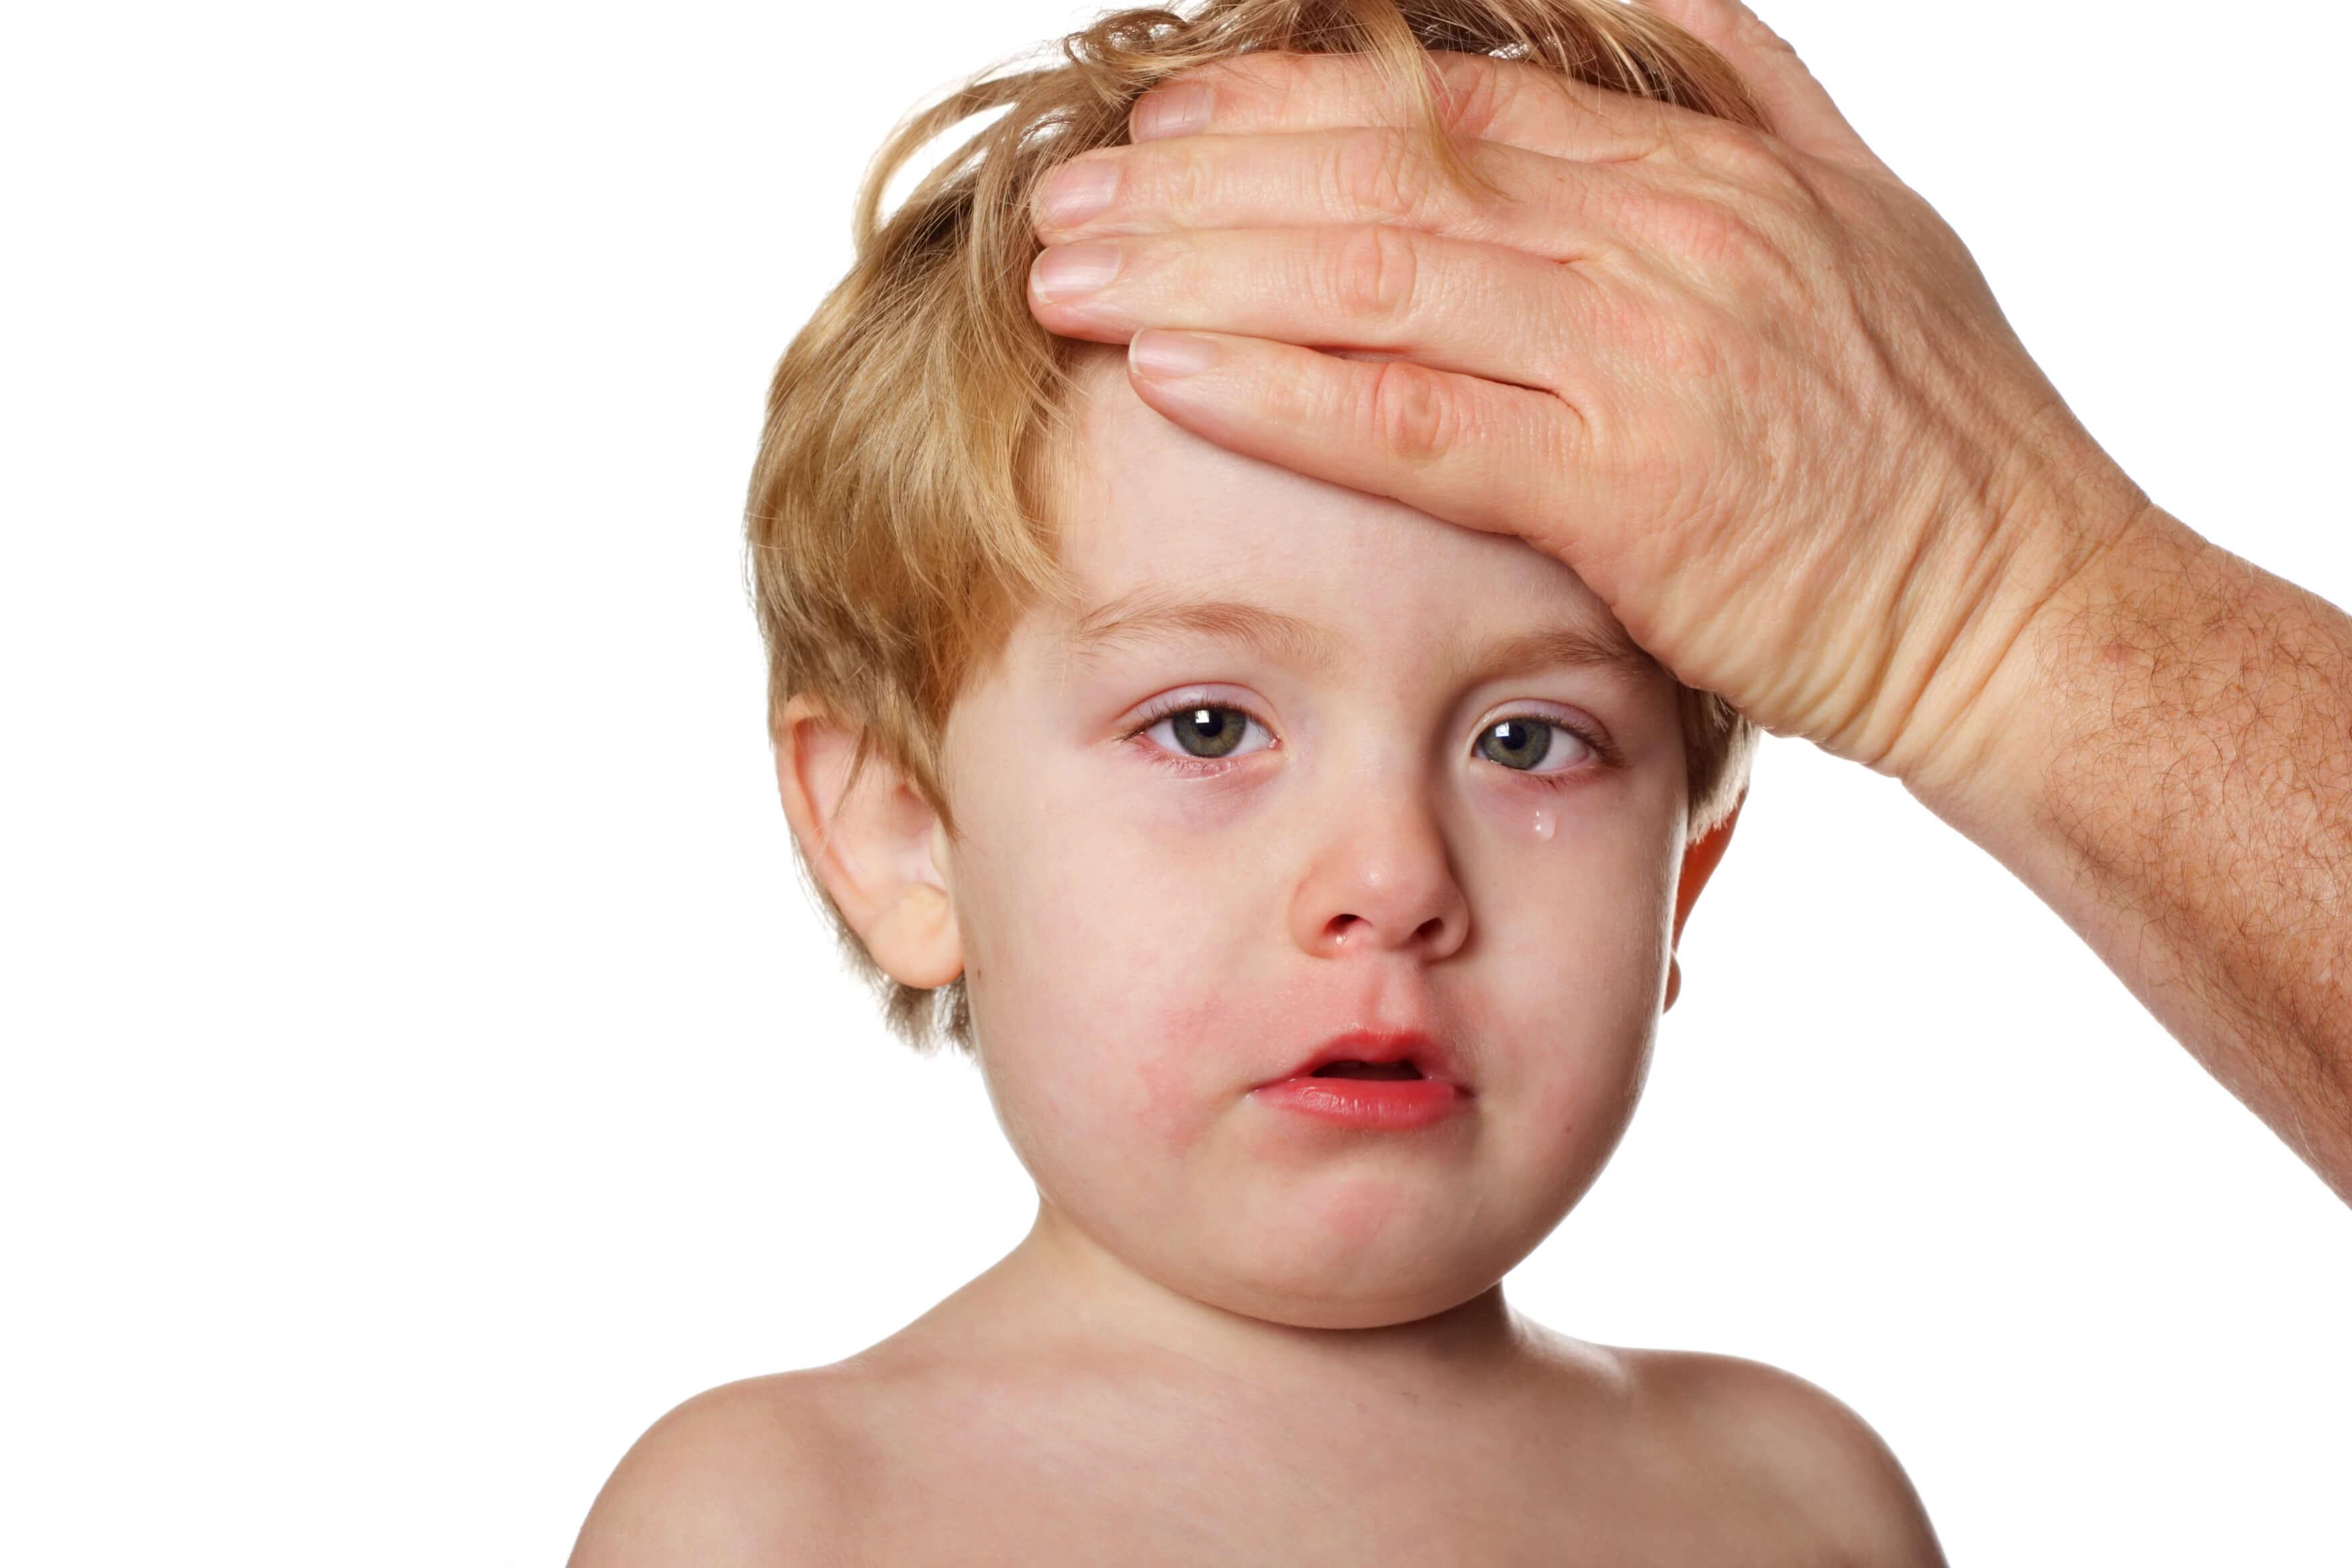 Identifying Viral Rash In Children